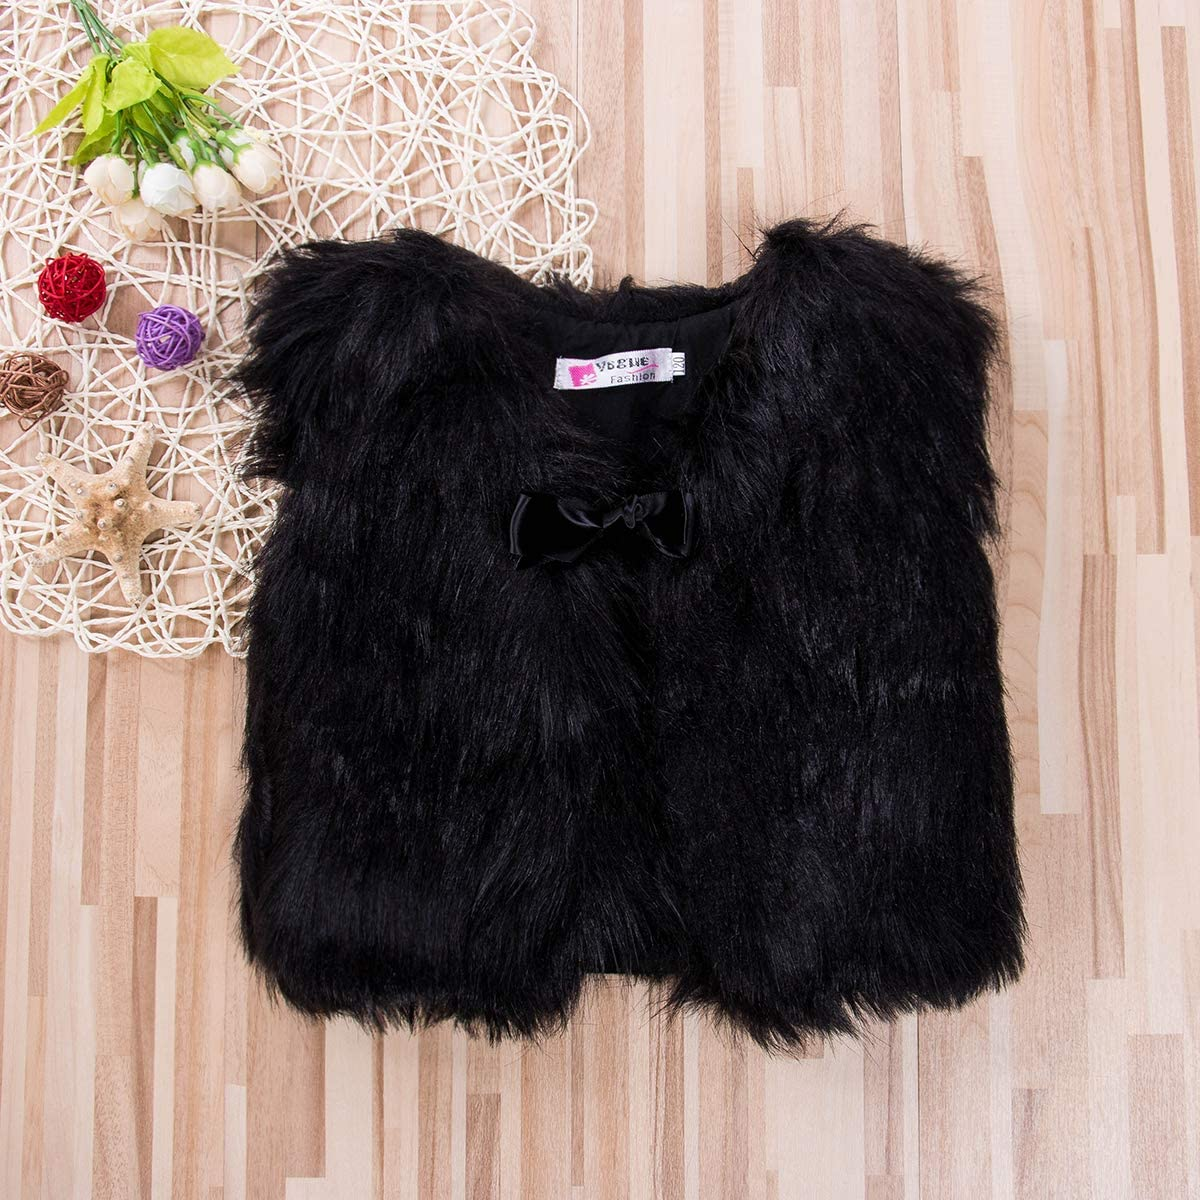 WANGSGOGO Toddler Baby Girl Faux Fur Vest Coat Winter Warm Waistcoat Gilet Outerwear Infant Clothes